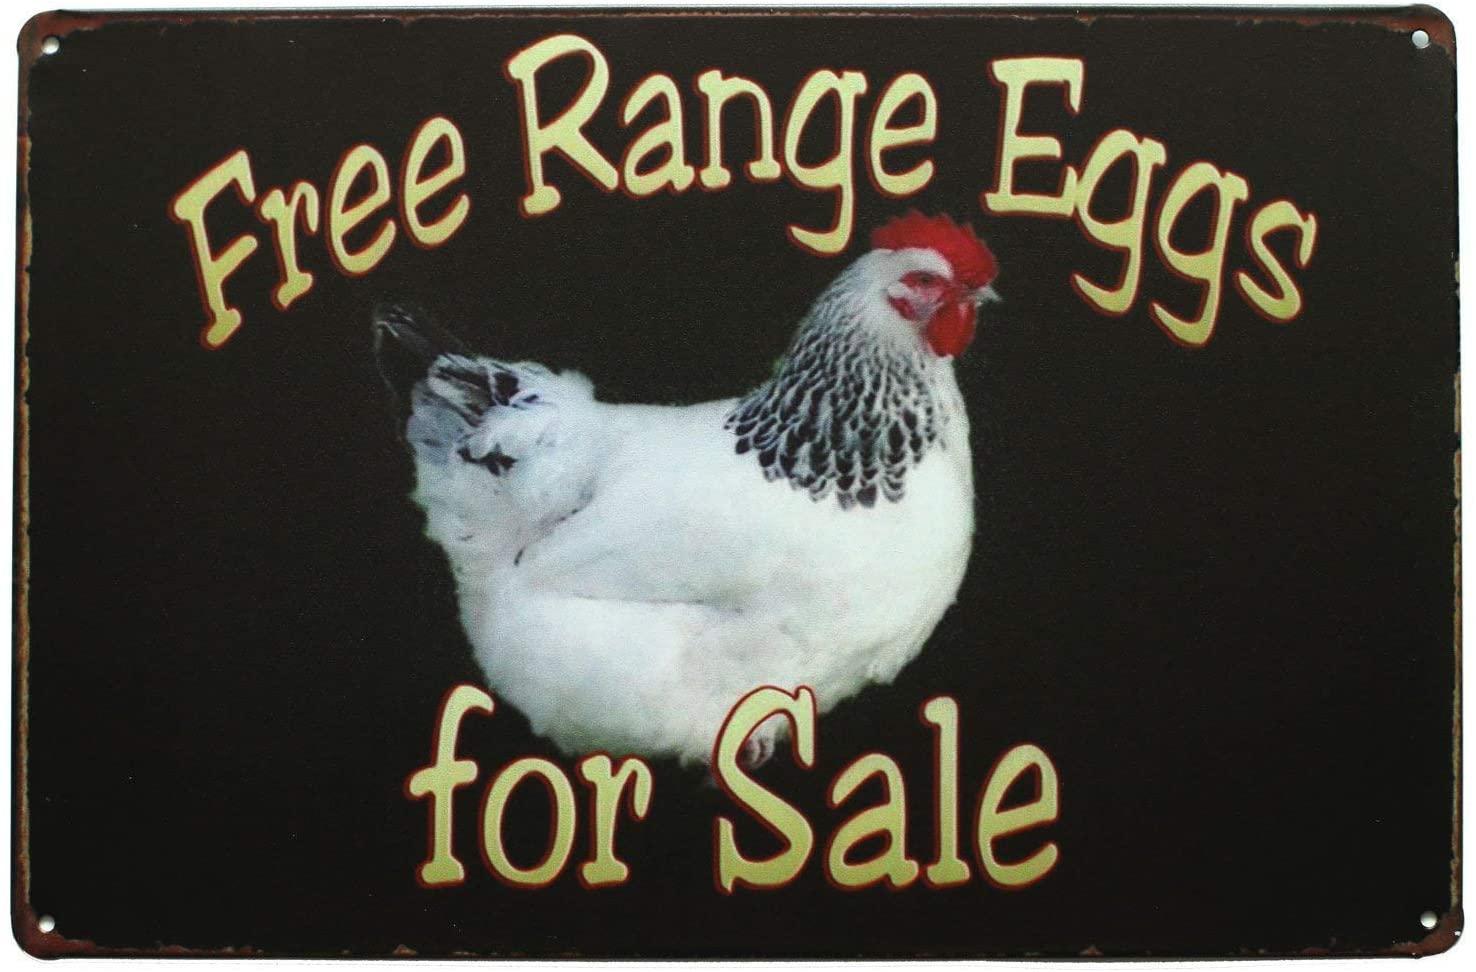 Non applicabile Metal Tar Tin Sign Decoration Iron Painting 8x12 pollici Gamma gratuita Eggs in vendita, Metallo